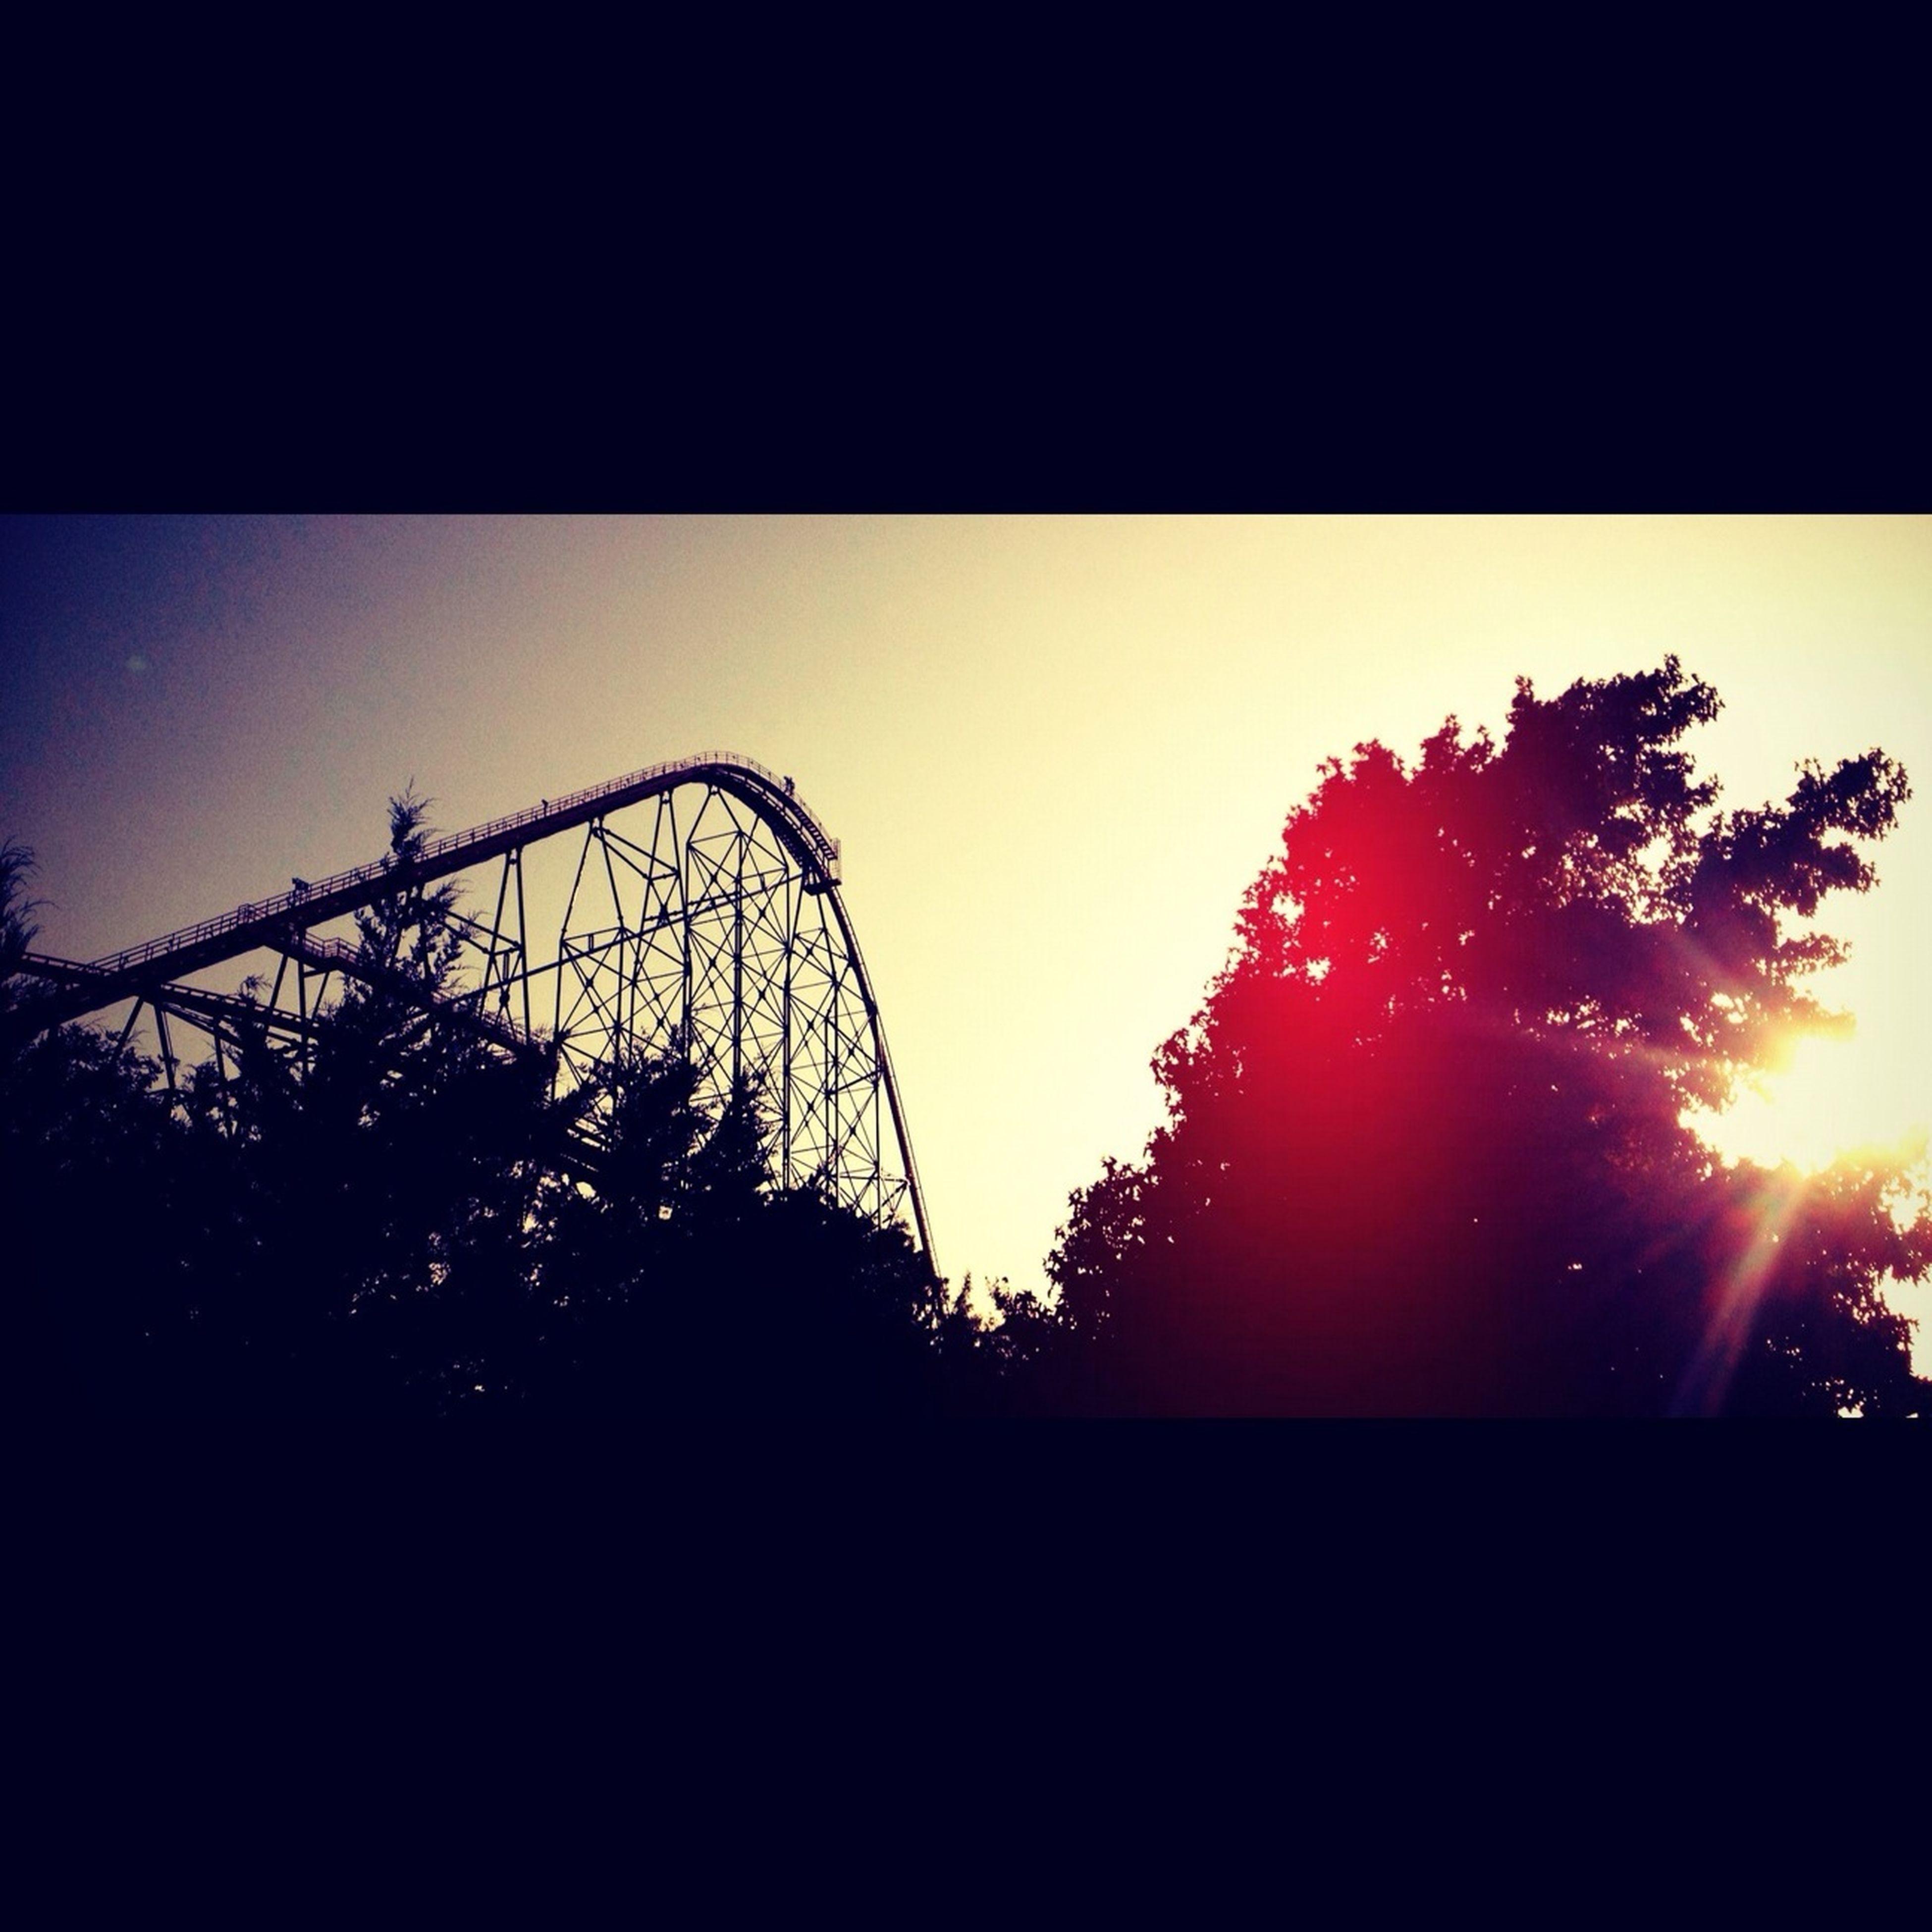 Six Flags, Titan. Beautiful Ride.